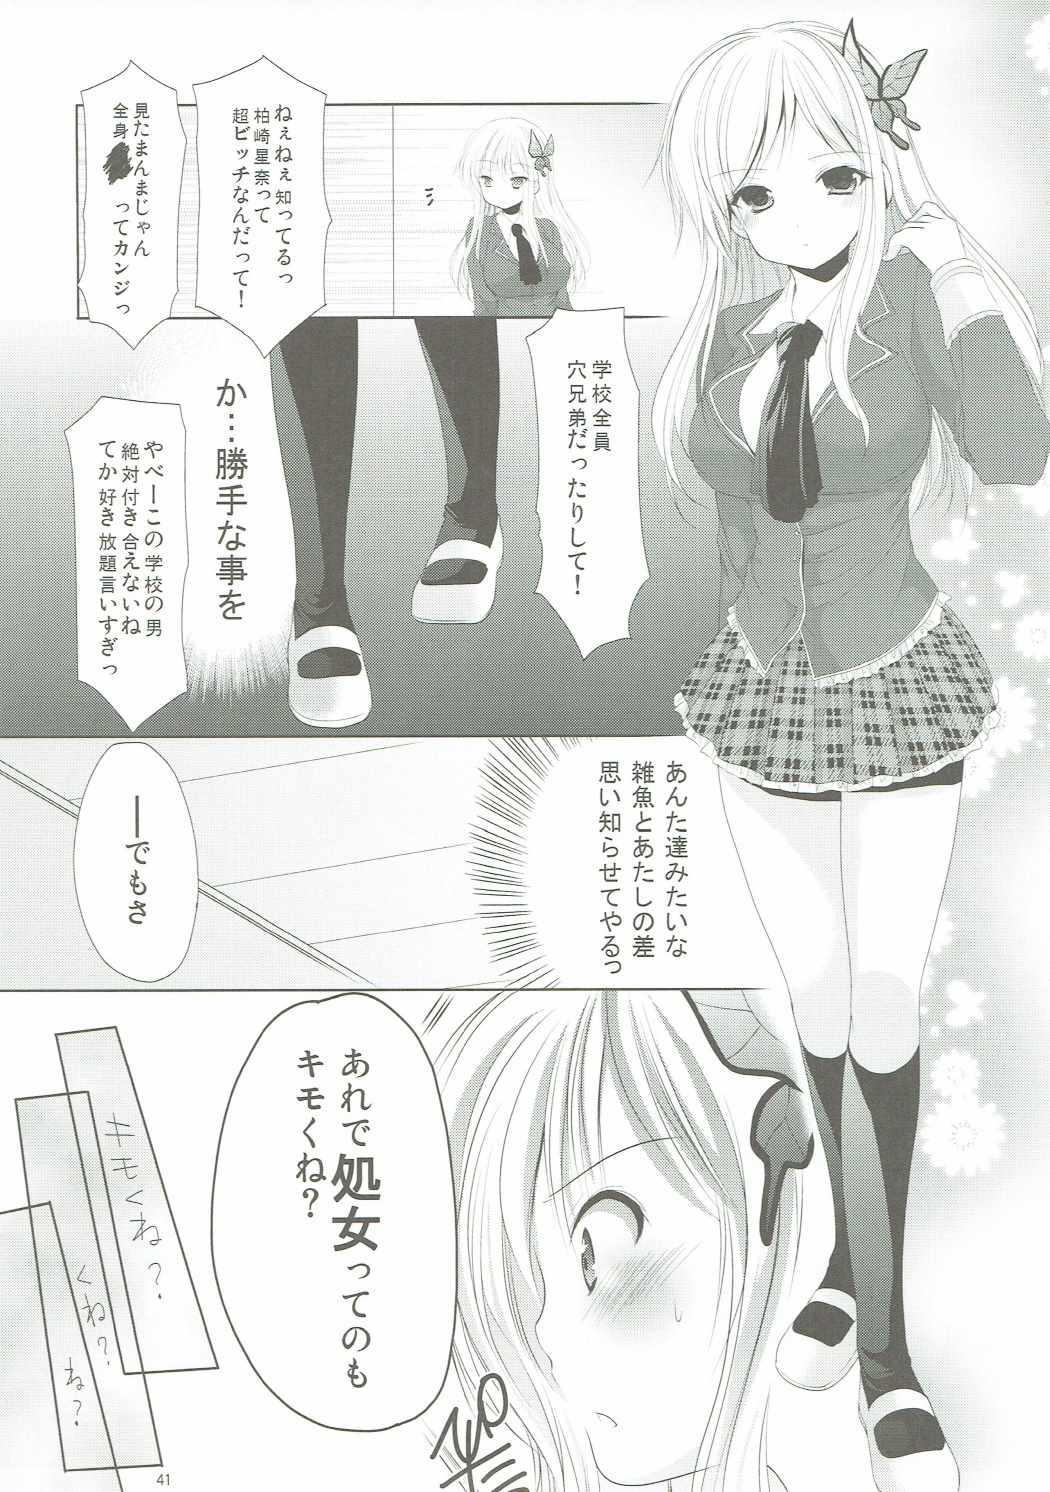 ANIME COLLECTION Imomuya Honpo - Singleton Anime Soushuuhen 39